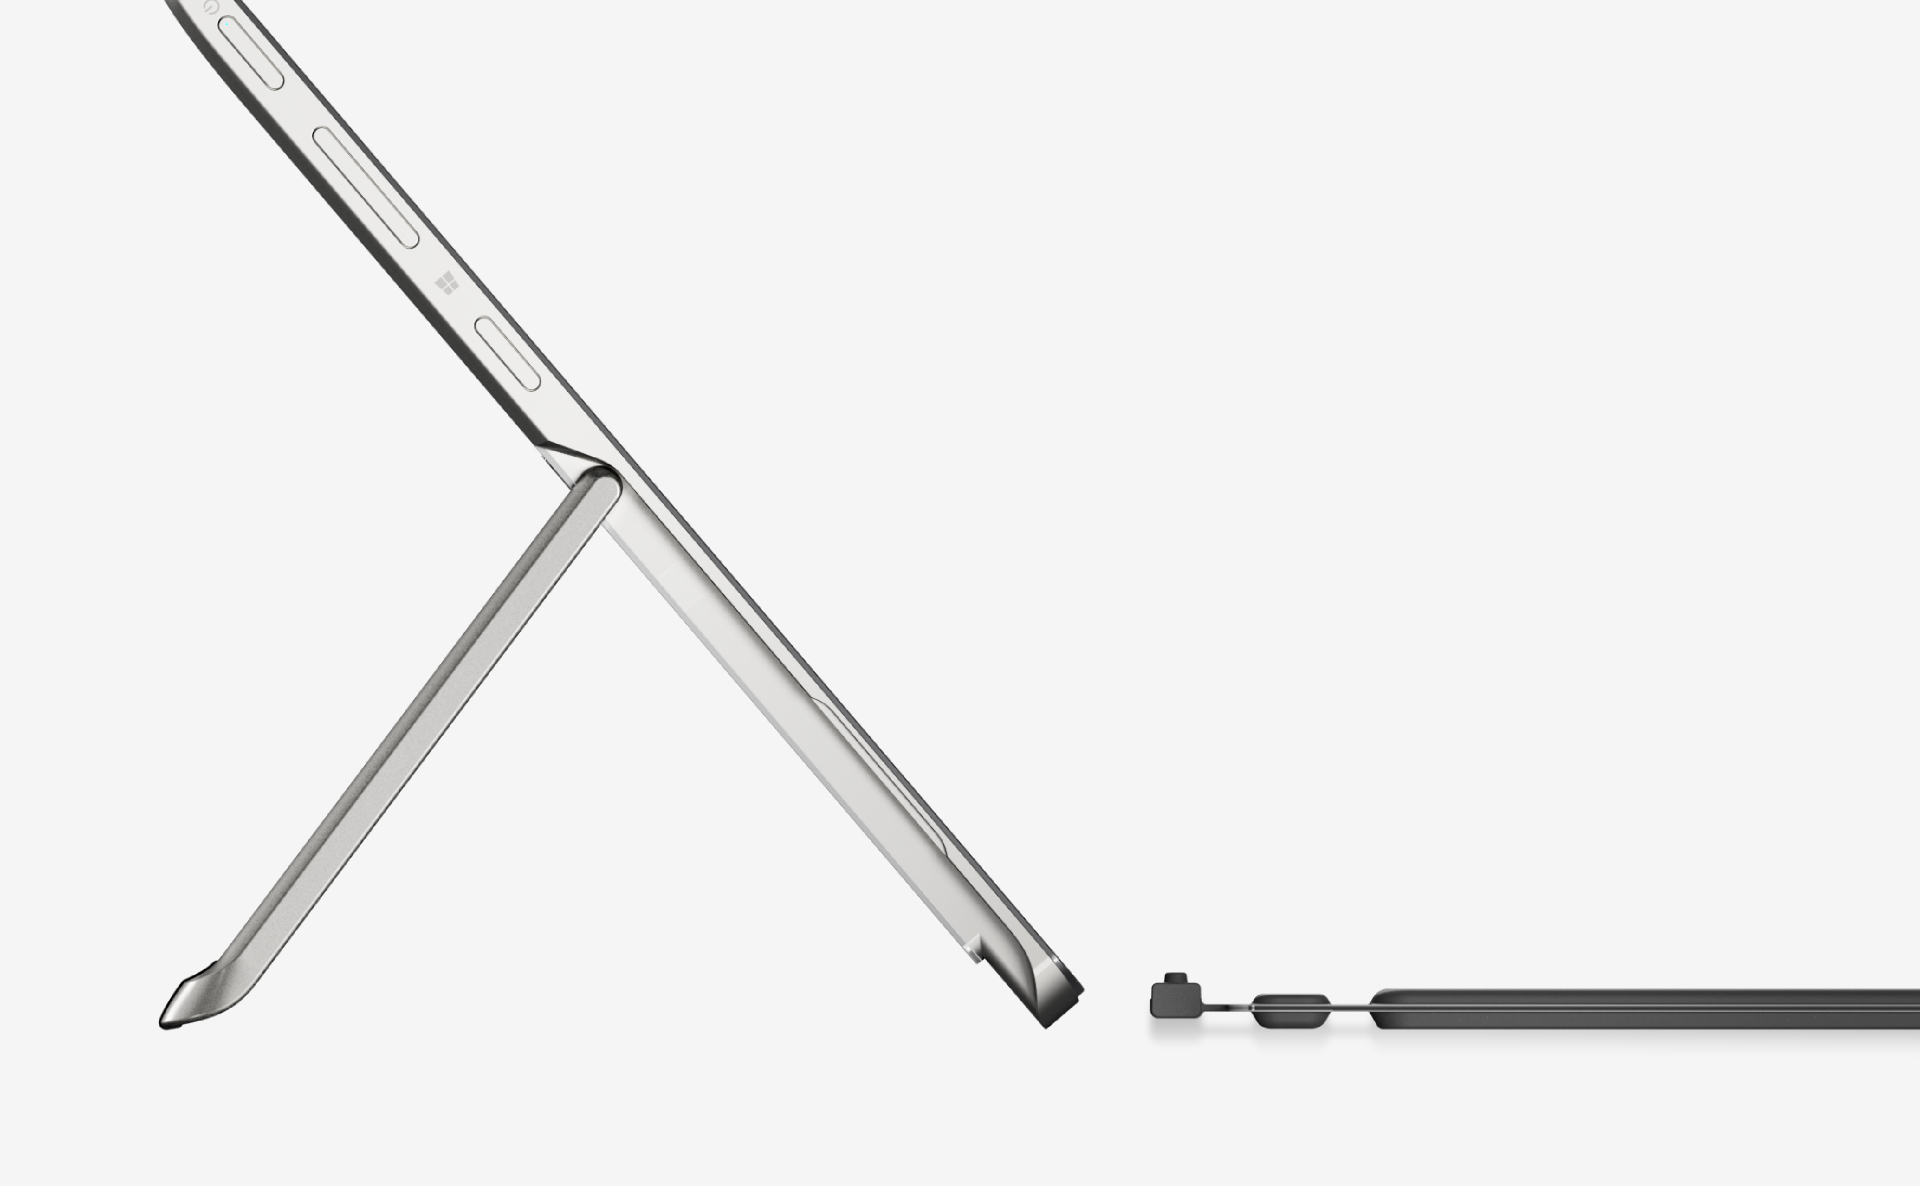 Acer Aspire Switch Alpha 12